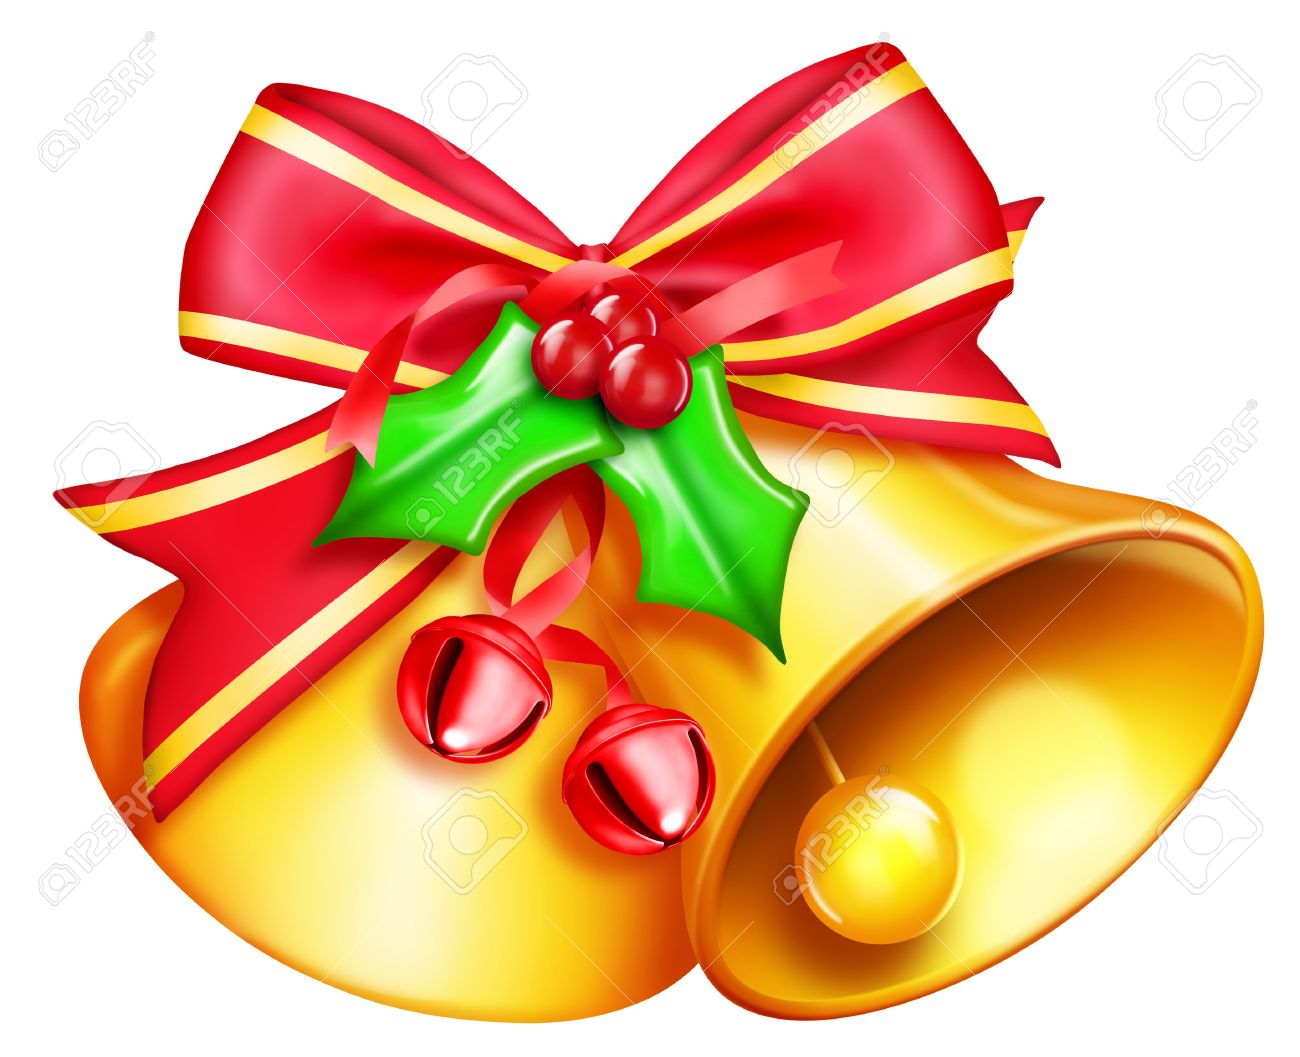 illustrated christmas bells stock photo 14963872 - Christmas Bell